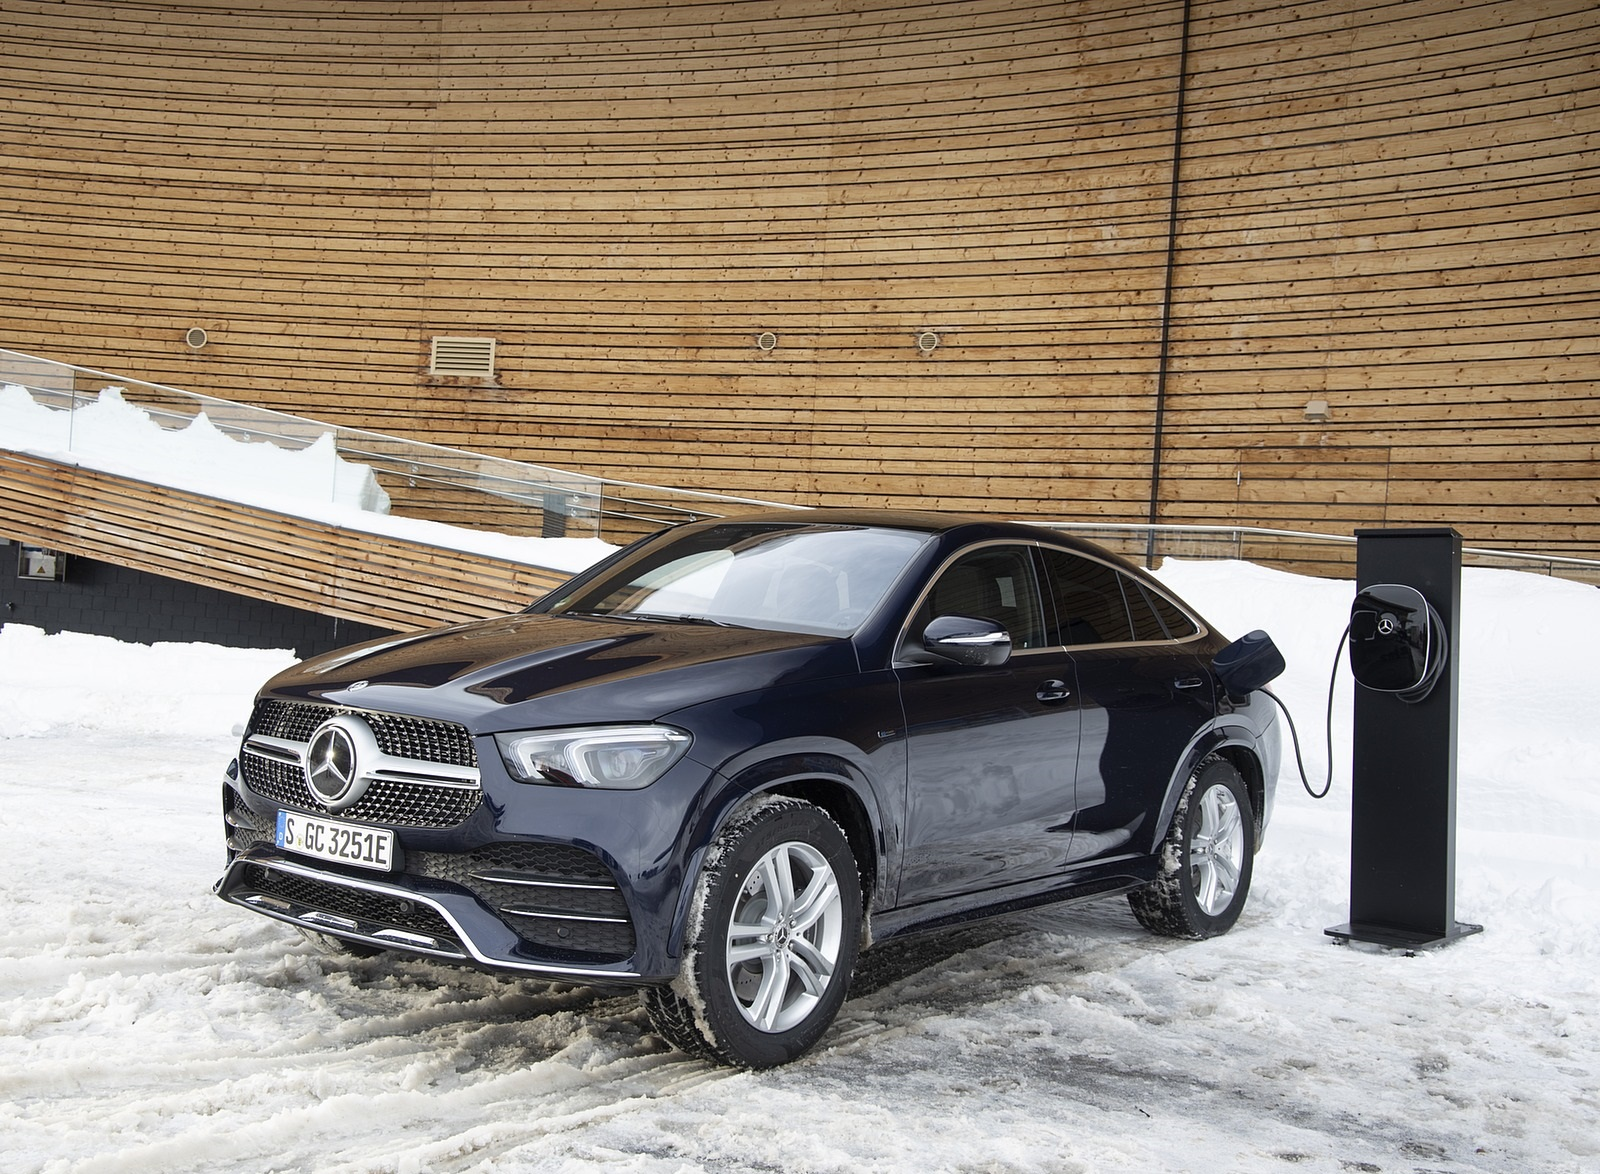 2021 Mercedes-Benz GLE Coupe 350 de 4MATIC Coupe (Color: Cavansite Blue Metallic Diesel Plug-In Hybrid) Charging Wallpapers (9)